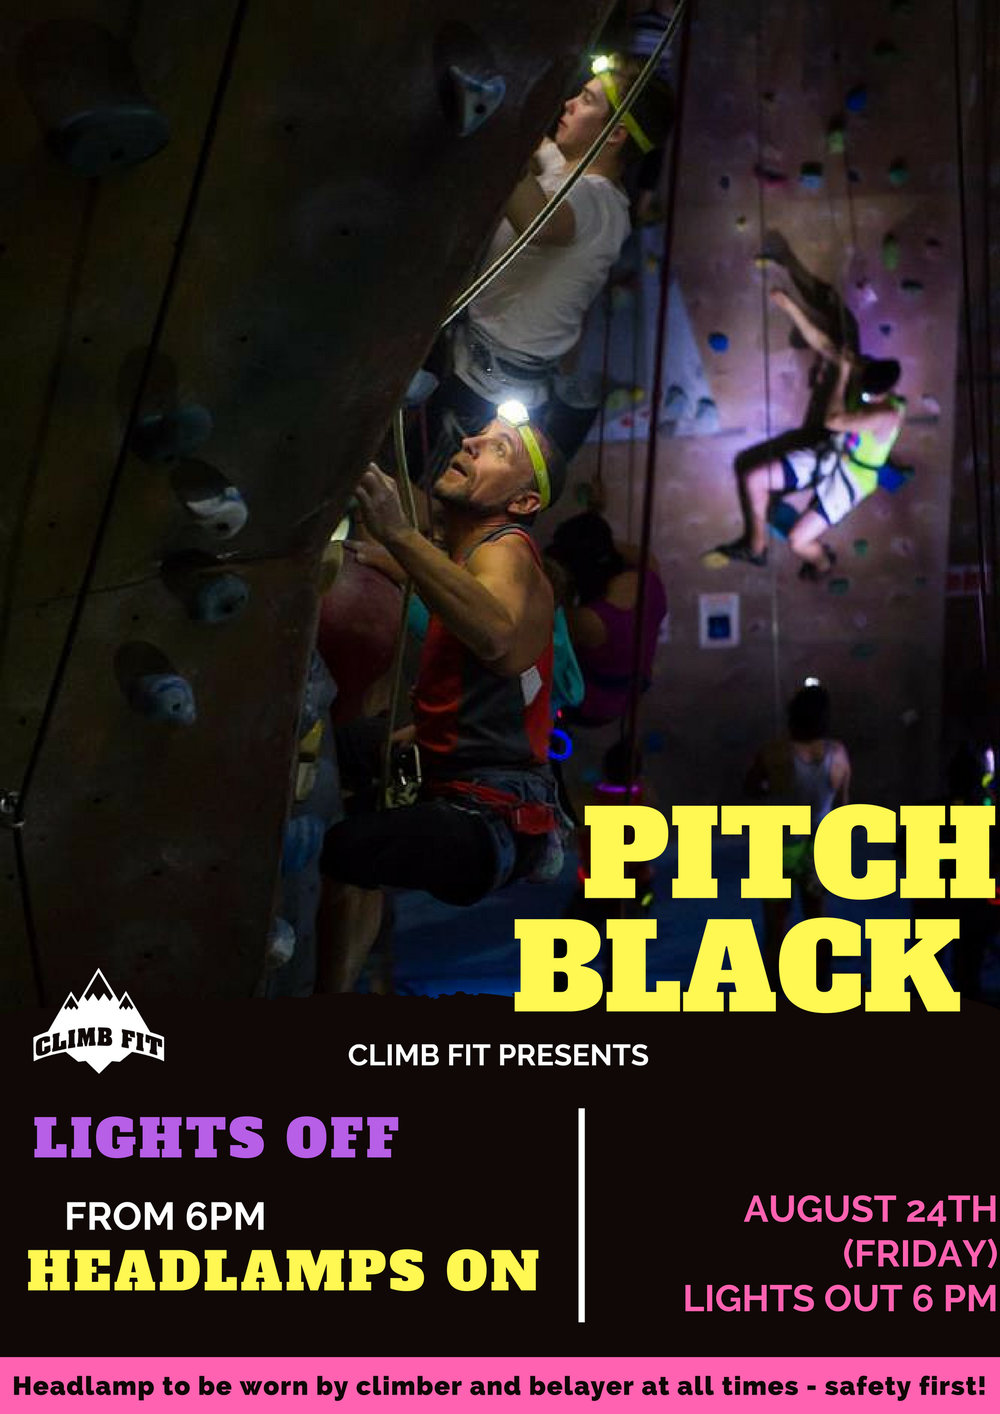 Pitch Black A4 Poster.jpg